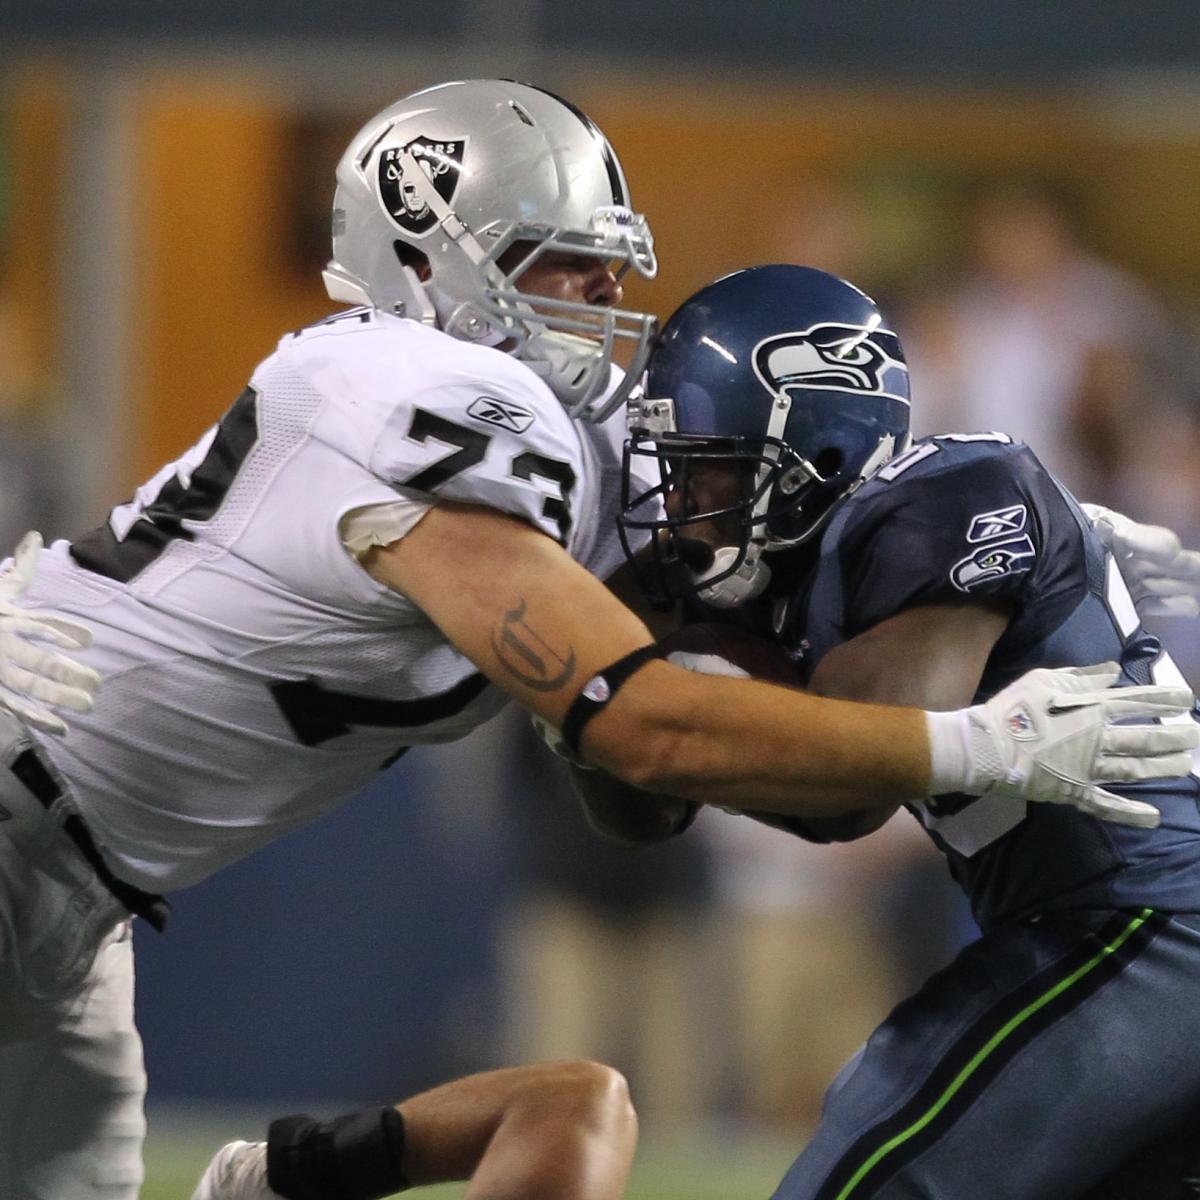 Denver Broncos Vs Detroit Lions Live Score Highlights And: Raiders Vs. Seahawks: TV Schedule, Live Stream, Radio